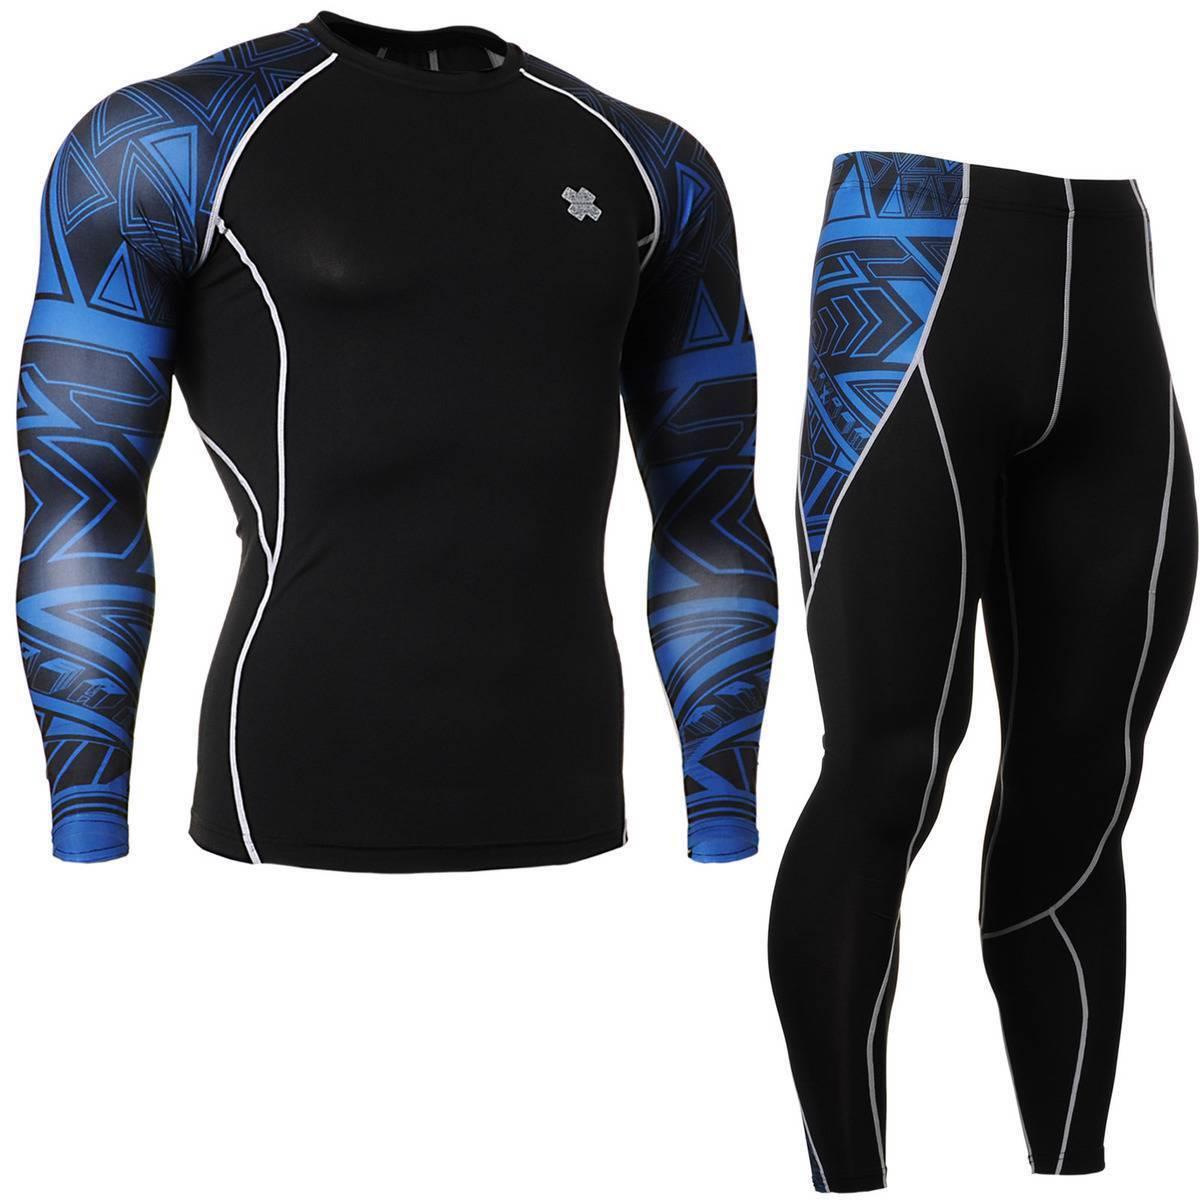 FIXGEAR CPD P2L-B1 SET Compression Shirts & Shorts Skin-tight MMA Training Gym